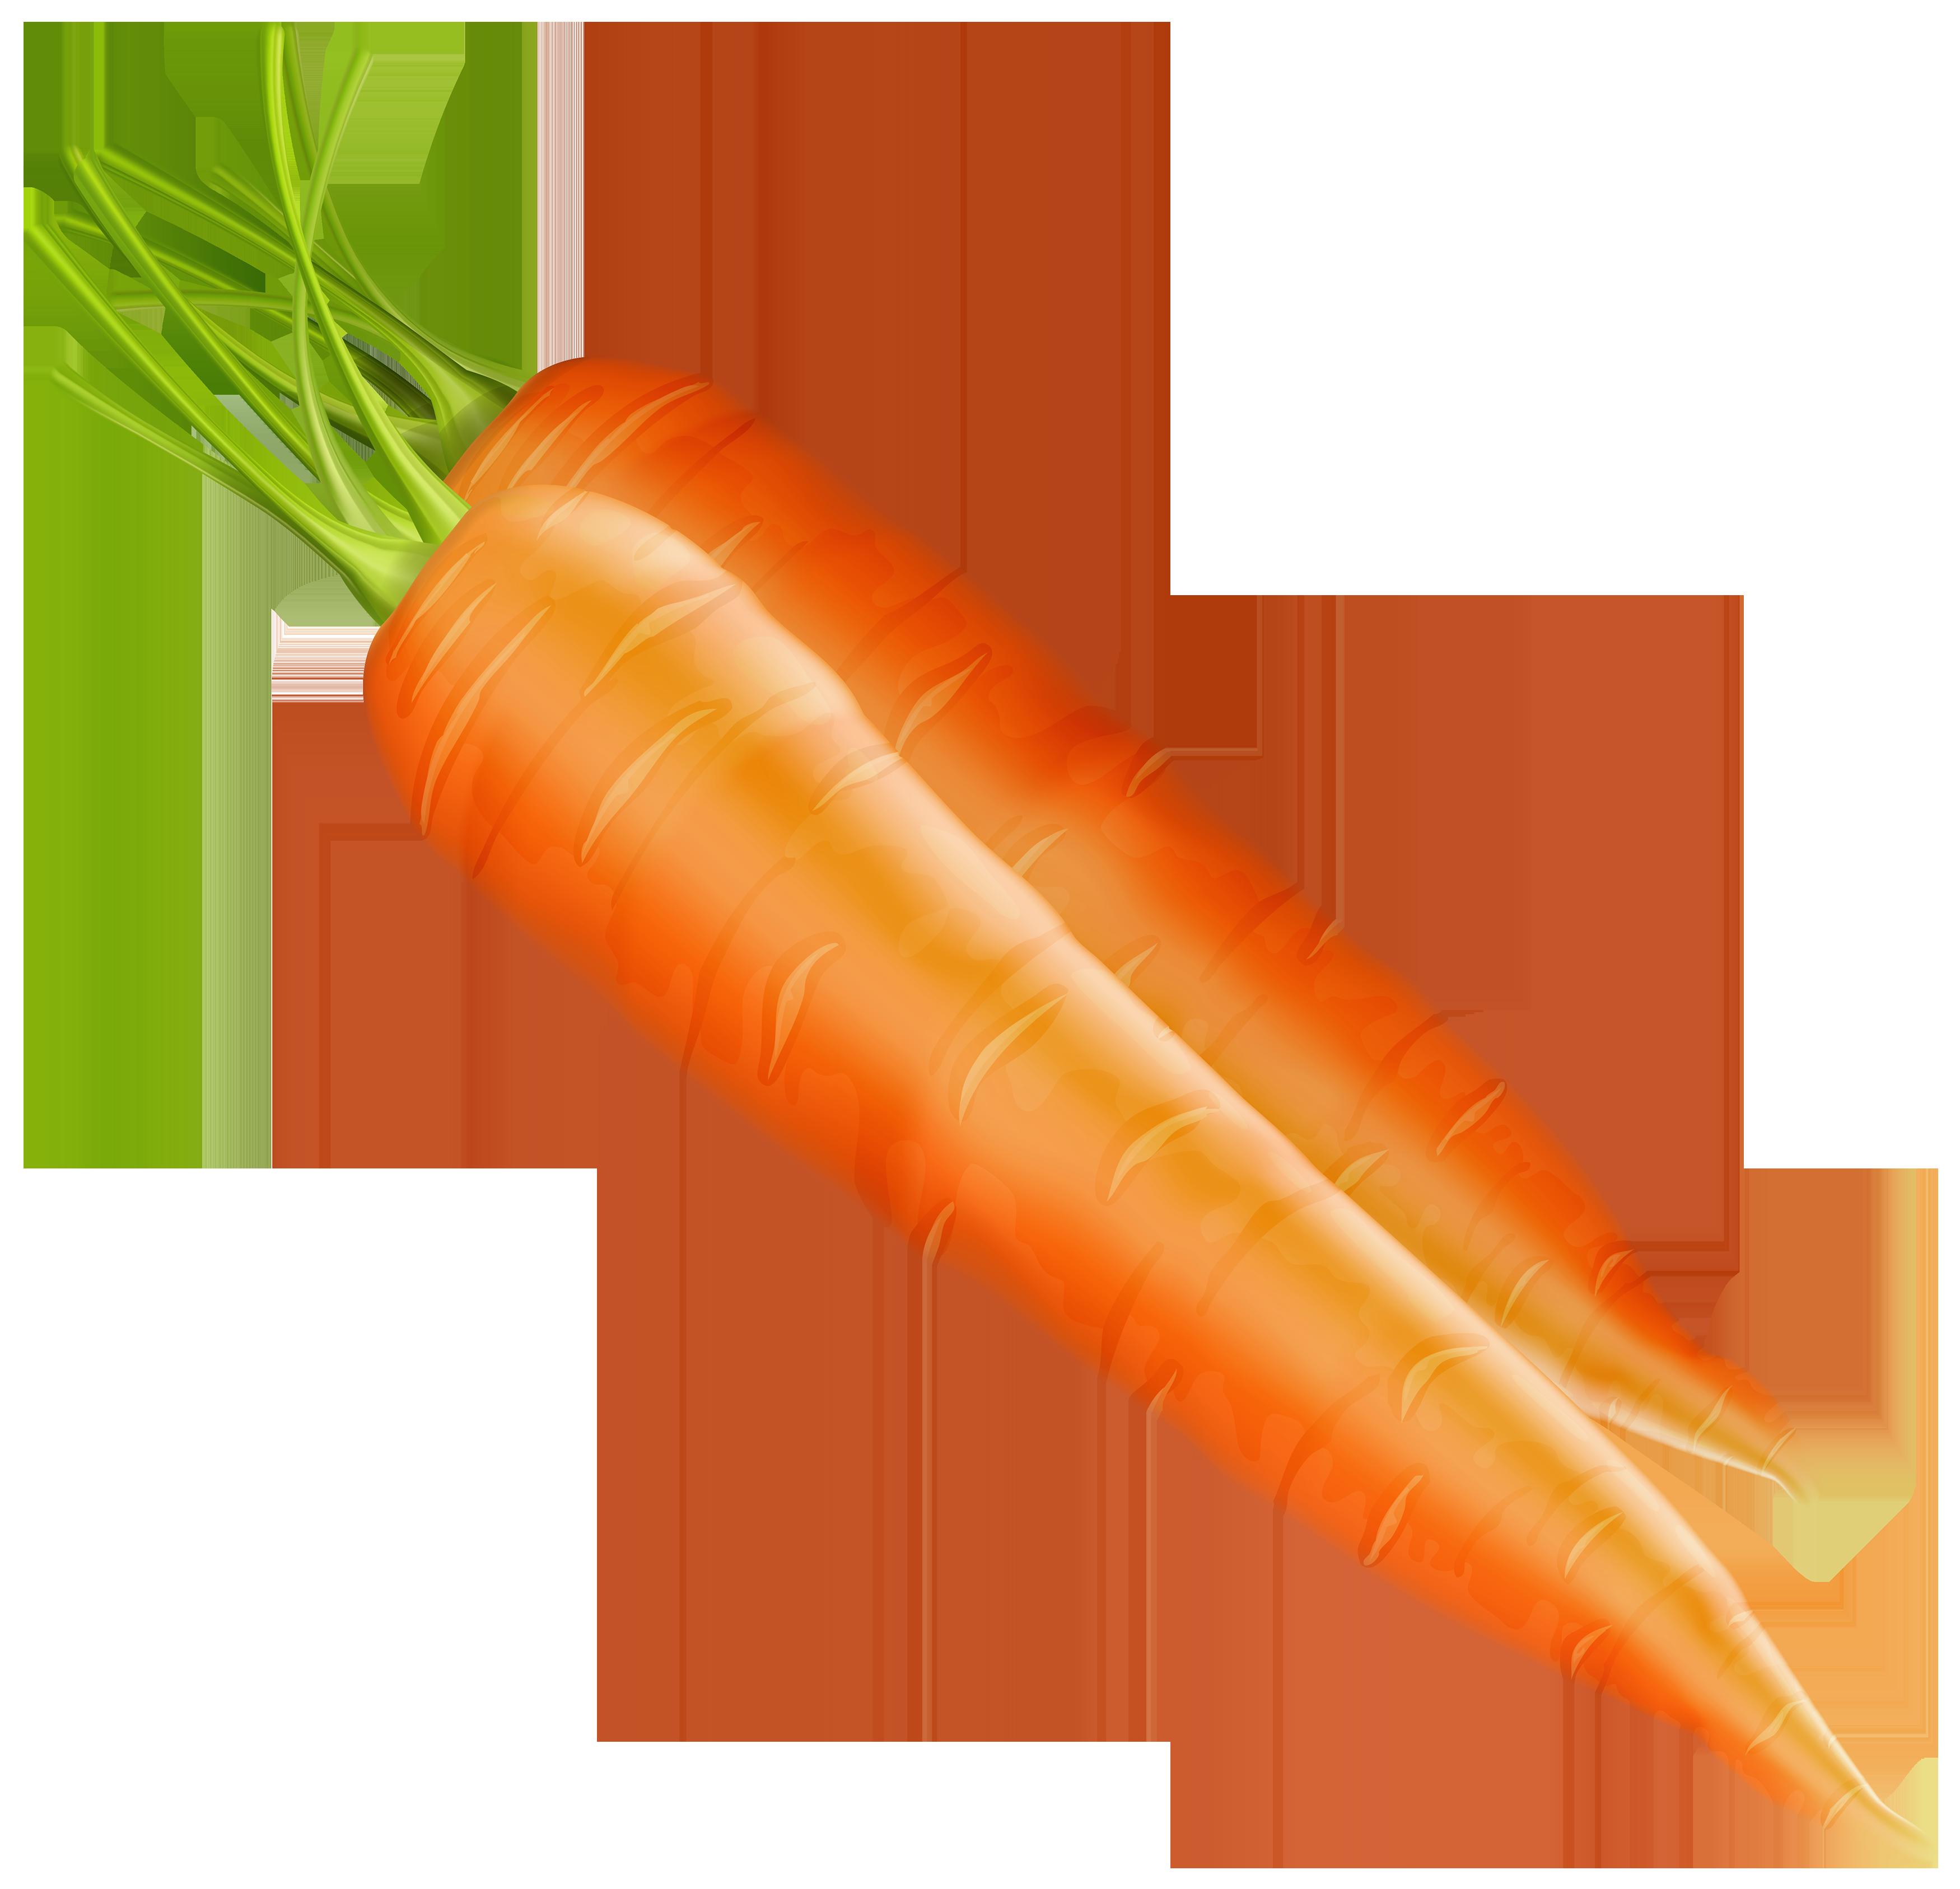 svg freeuse download Carrots clipart. Png best web